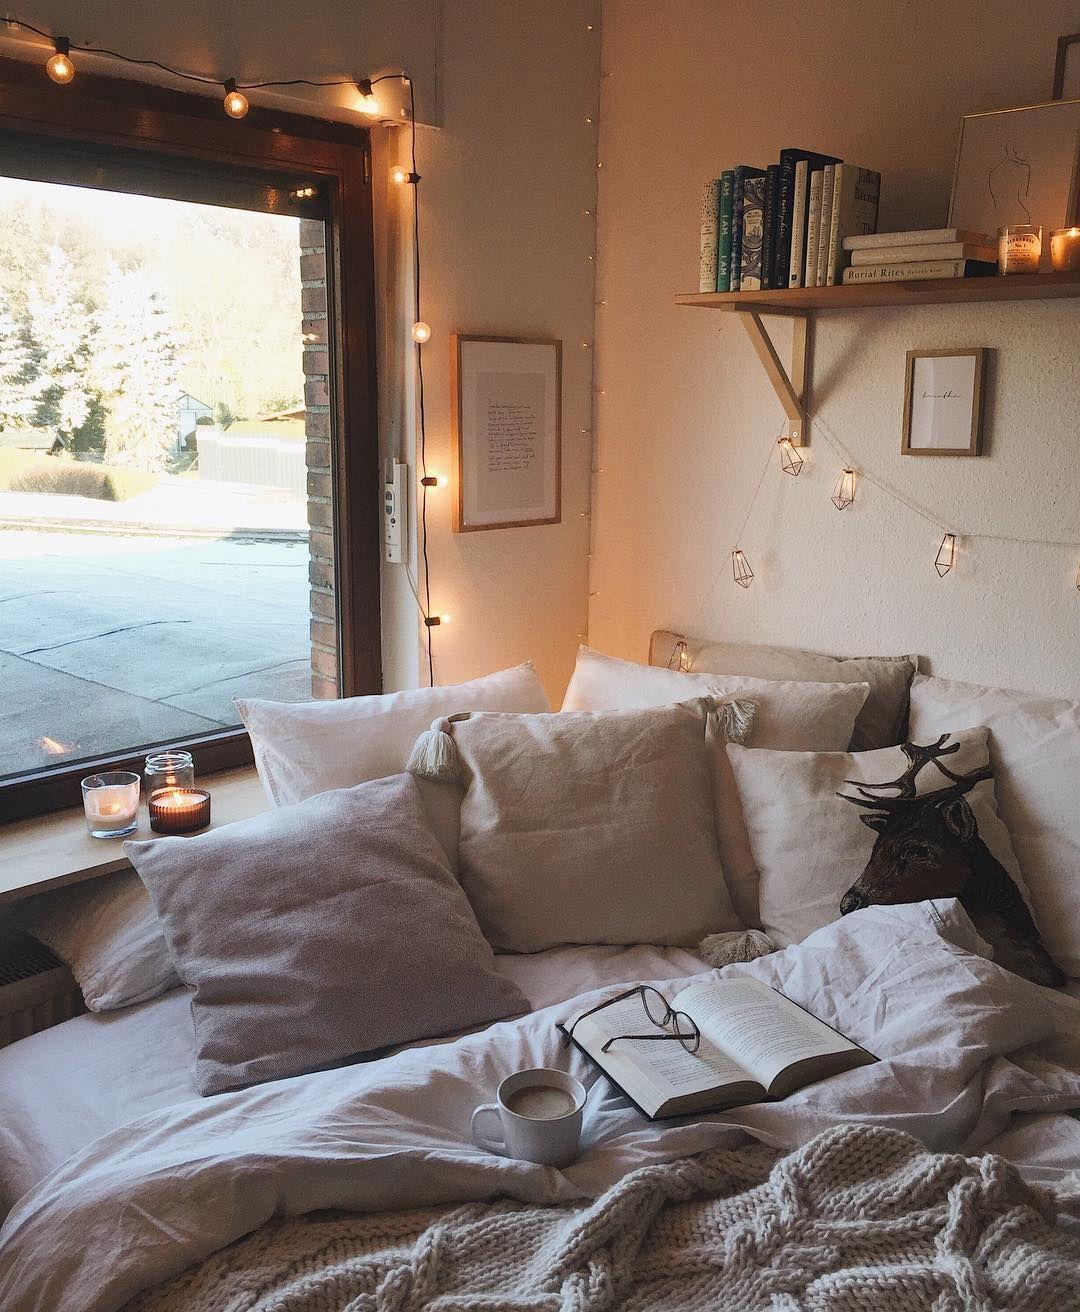 Ikea O Mondo Convenienza pin<|>ernikar | dorm room decor, home decor bedroom